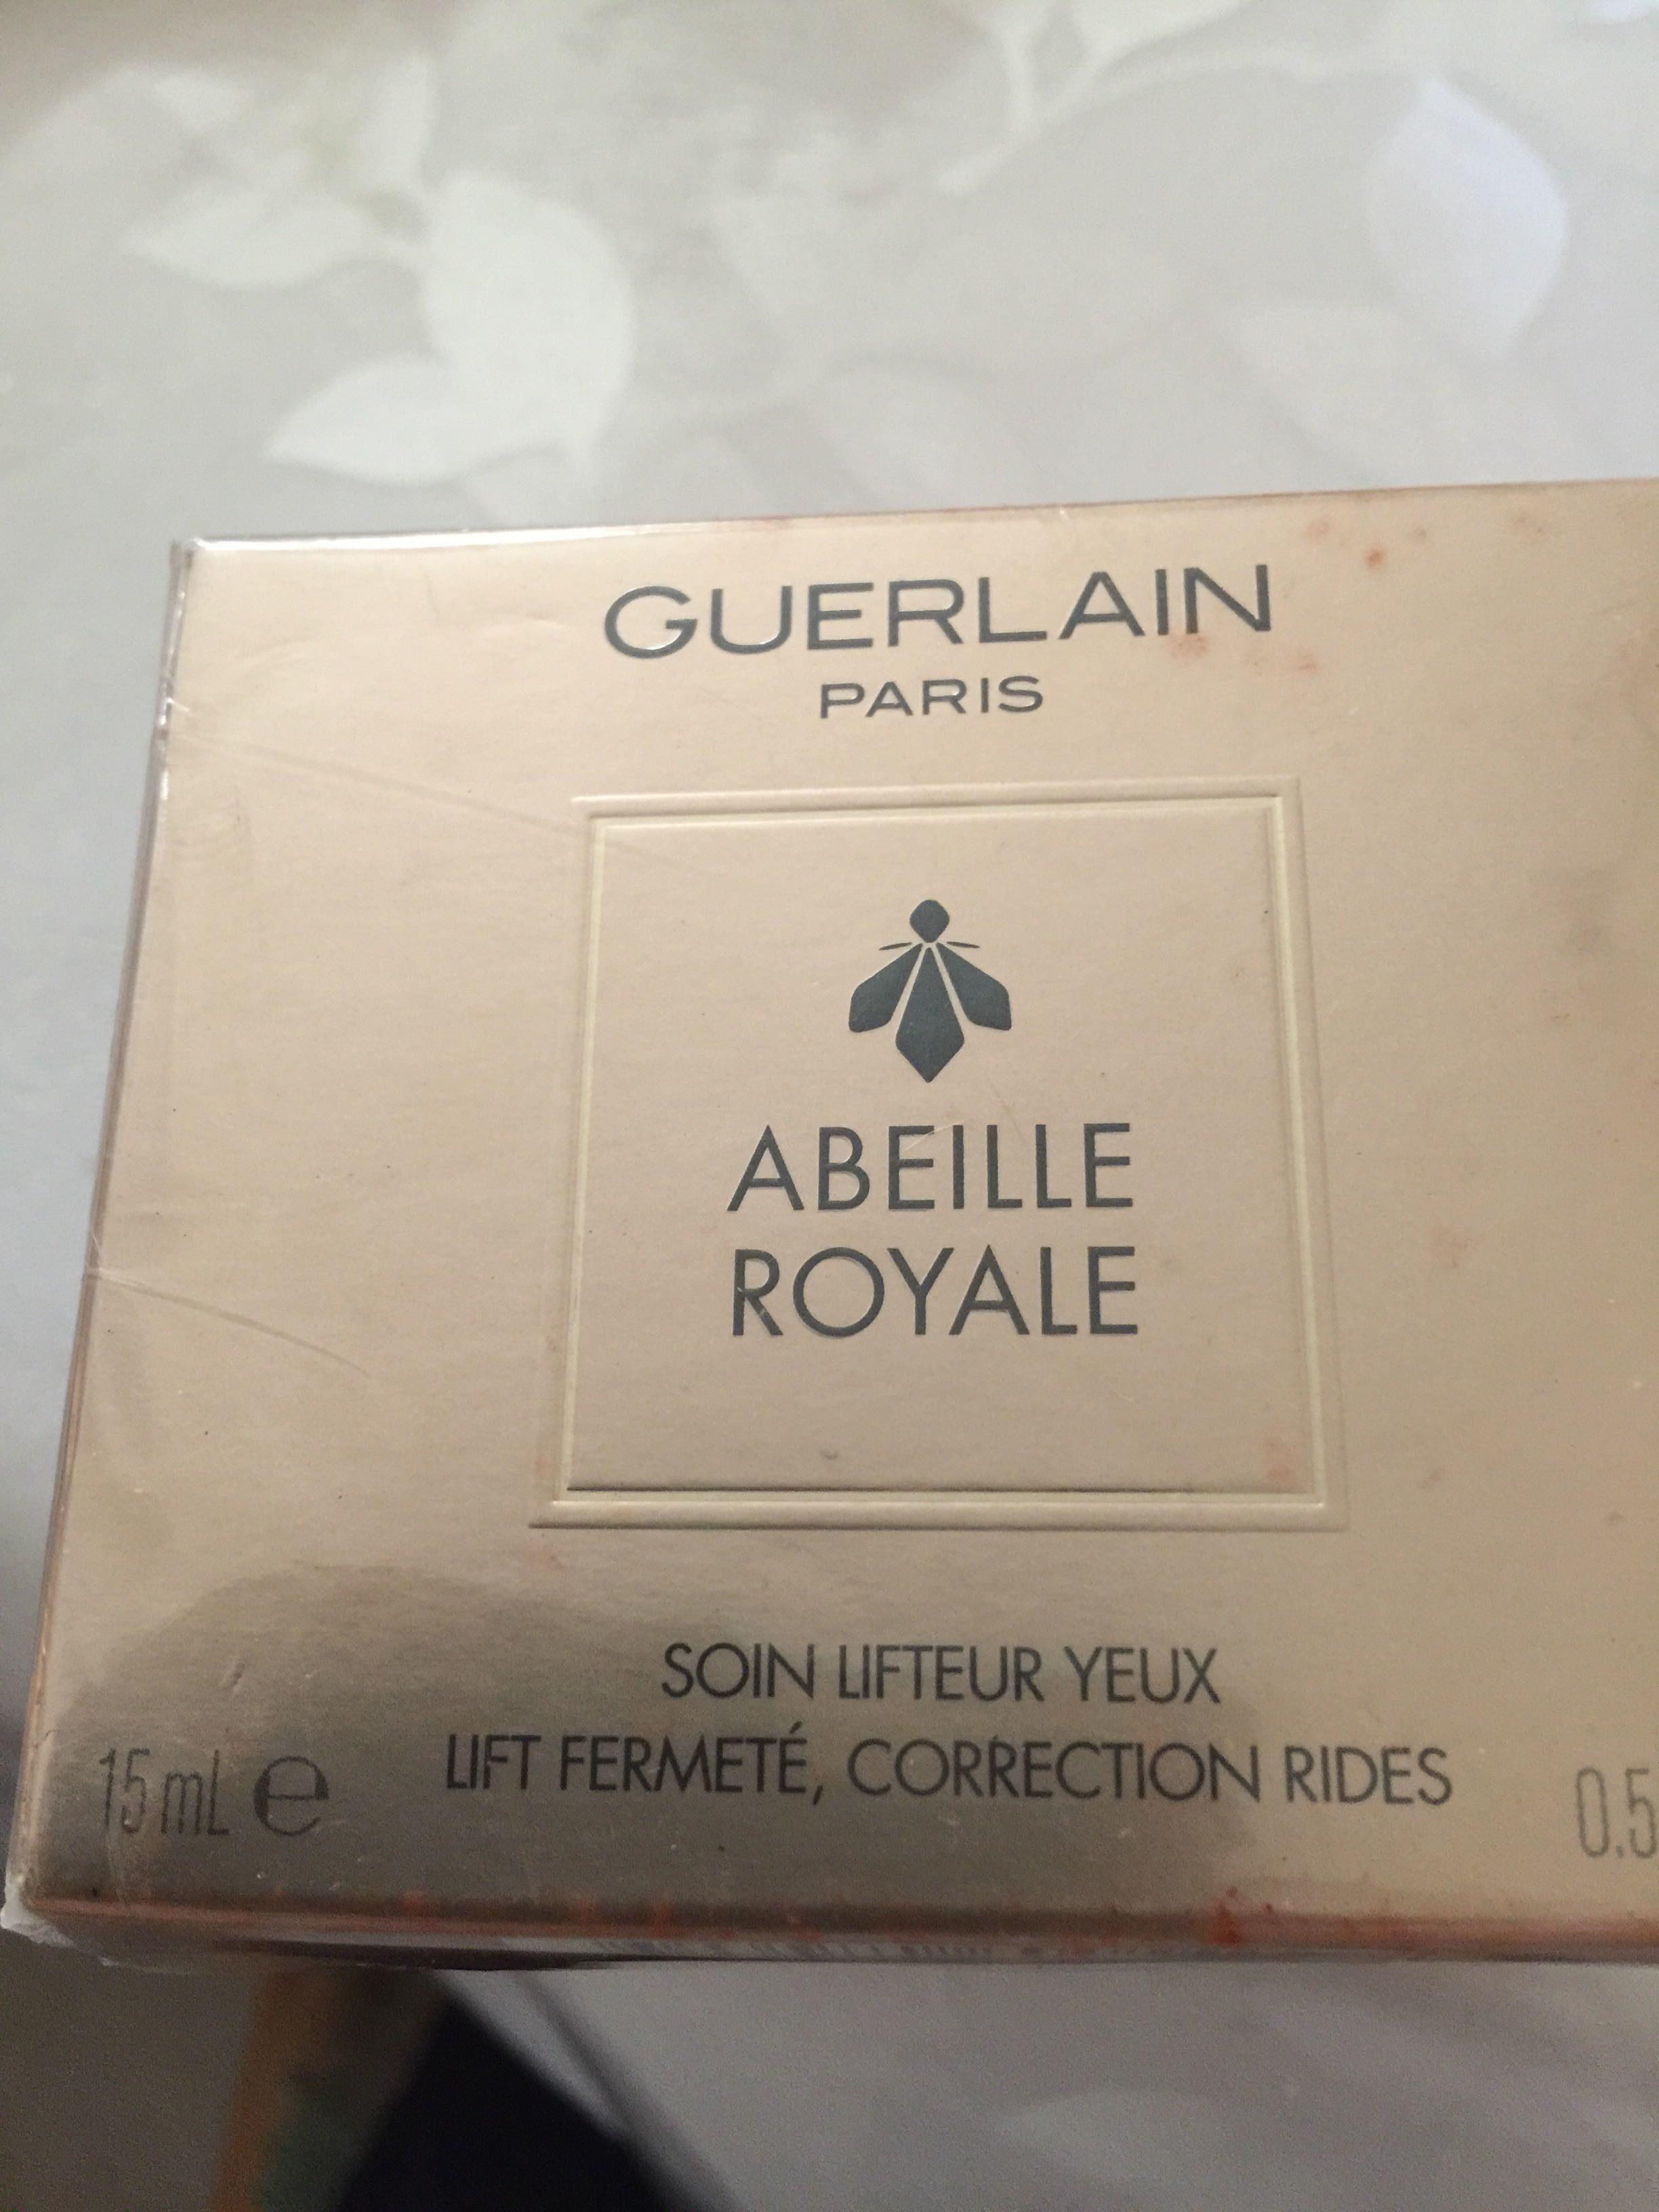 Abeille royale - Product - fr